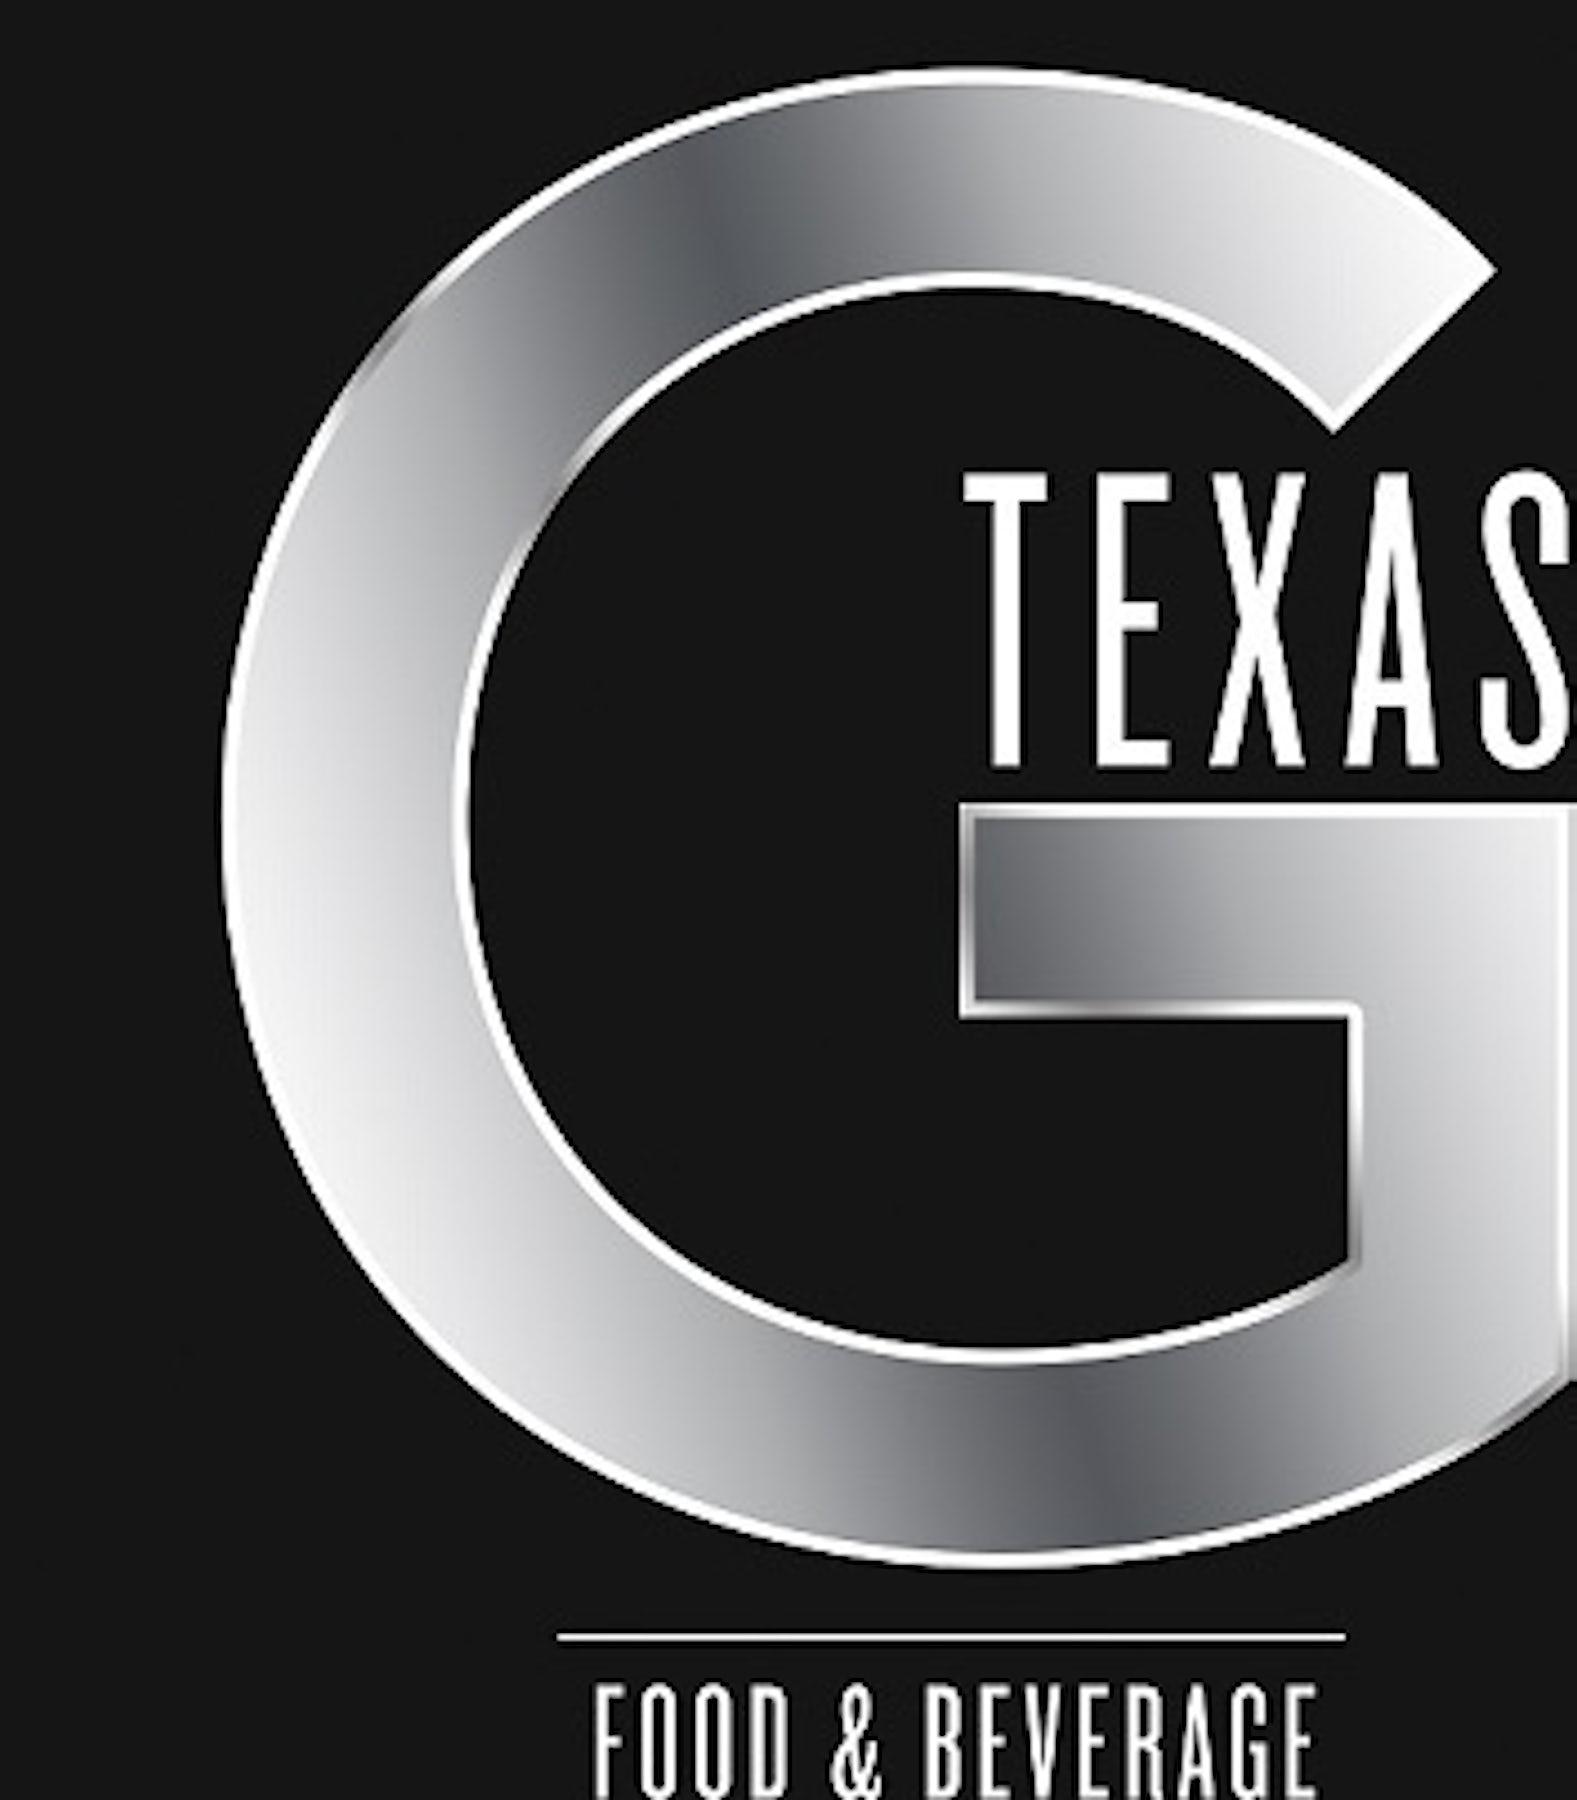 G Texas Custom Catering in Beyond Dallas